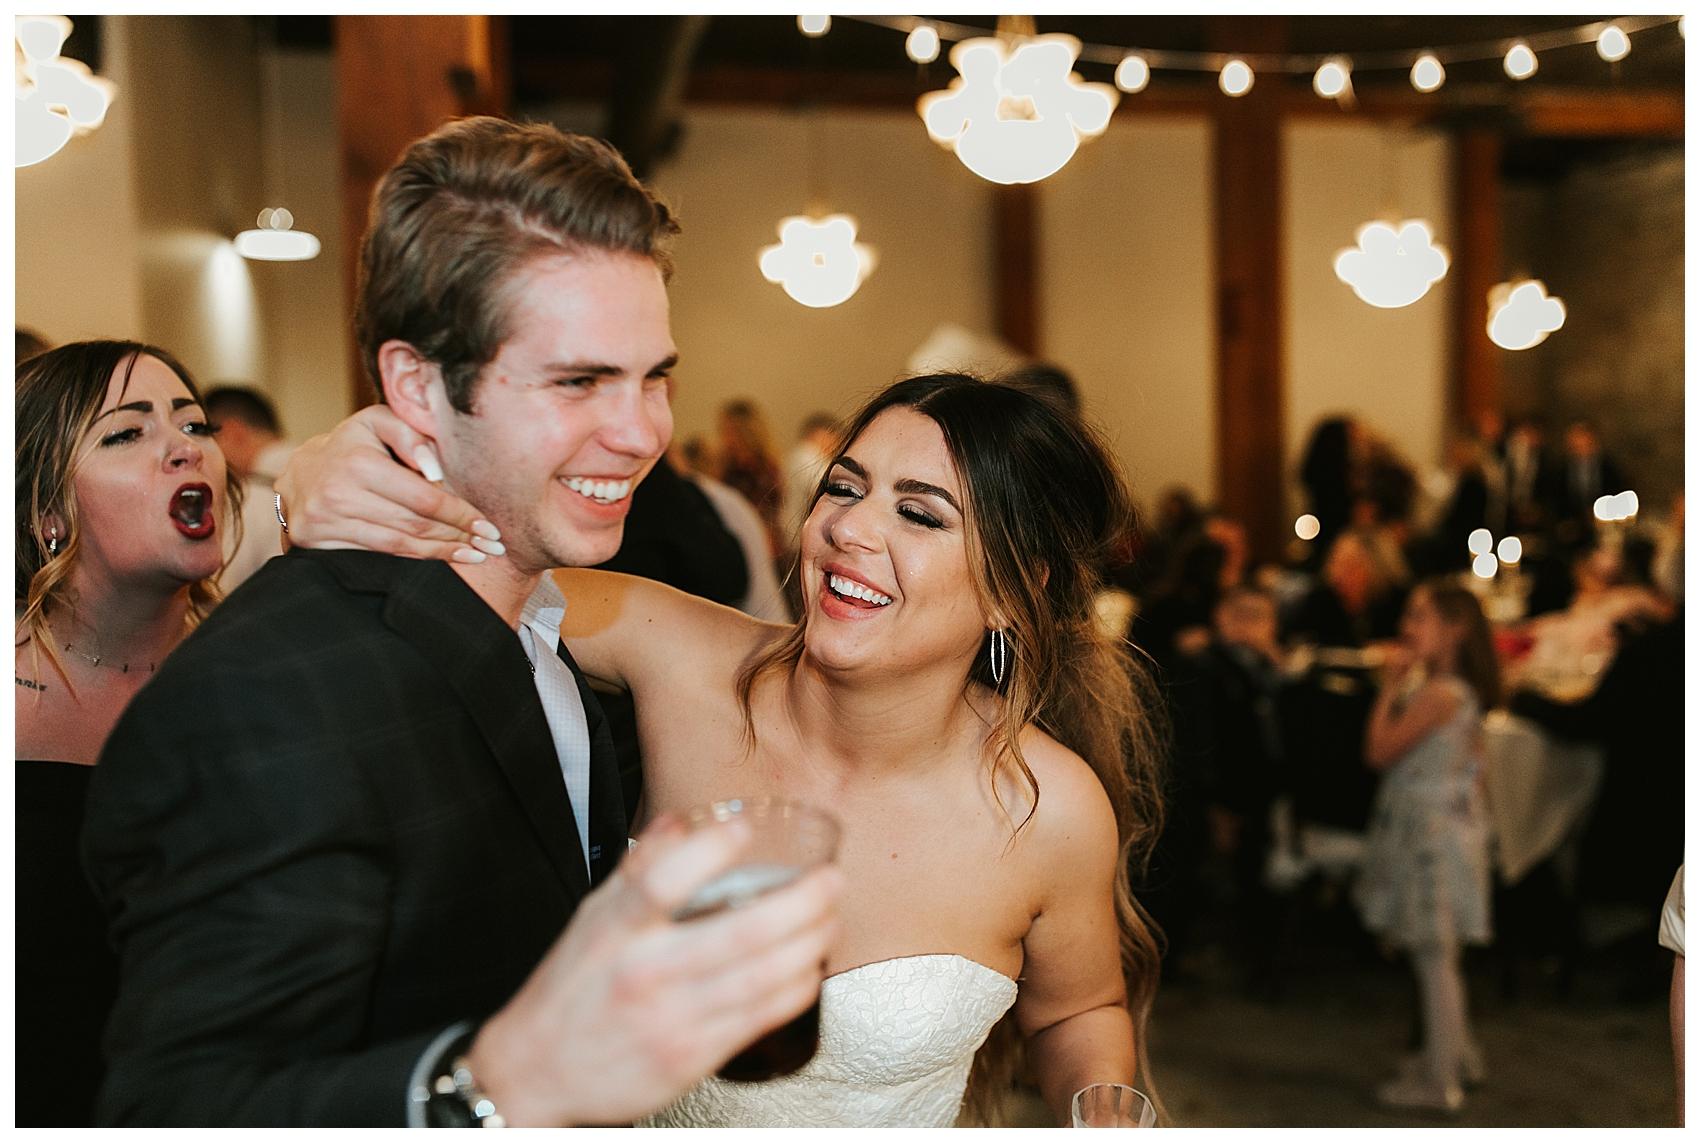 Chateau Rive Spokane Wedding Cassie Trottier Photography01111.jpg